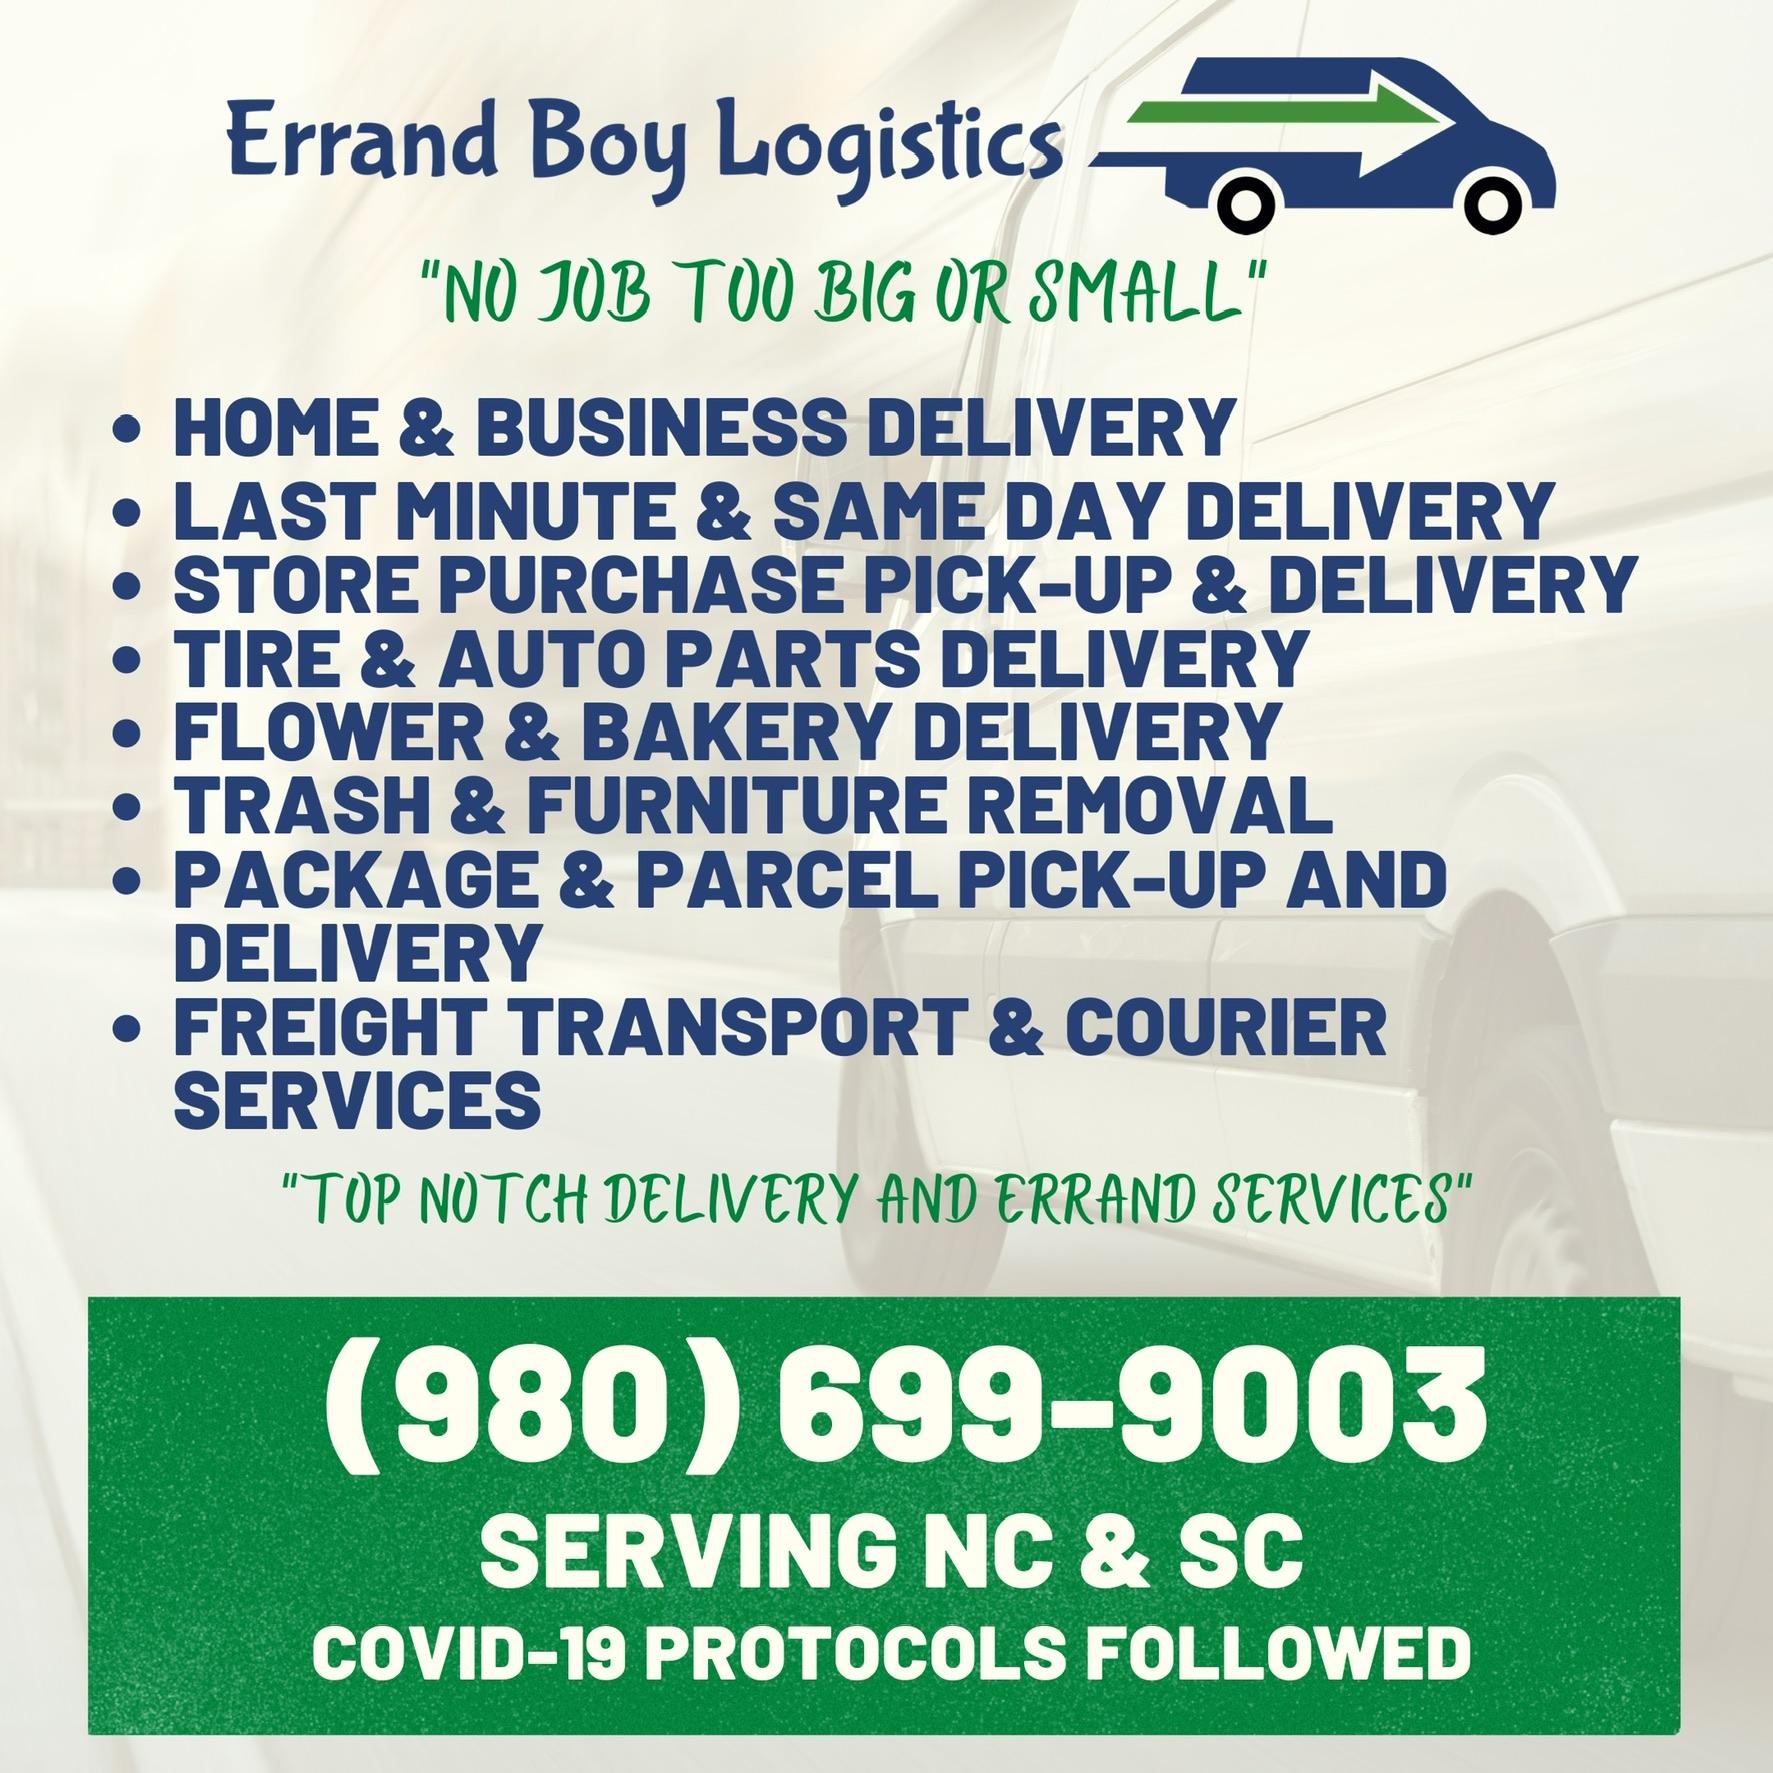 Errand Boy Logistics